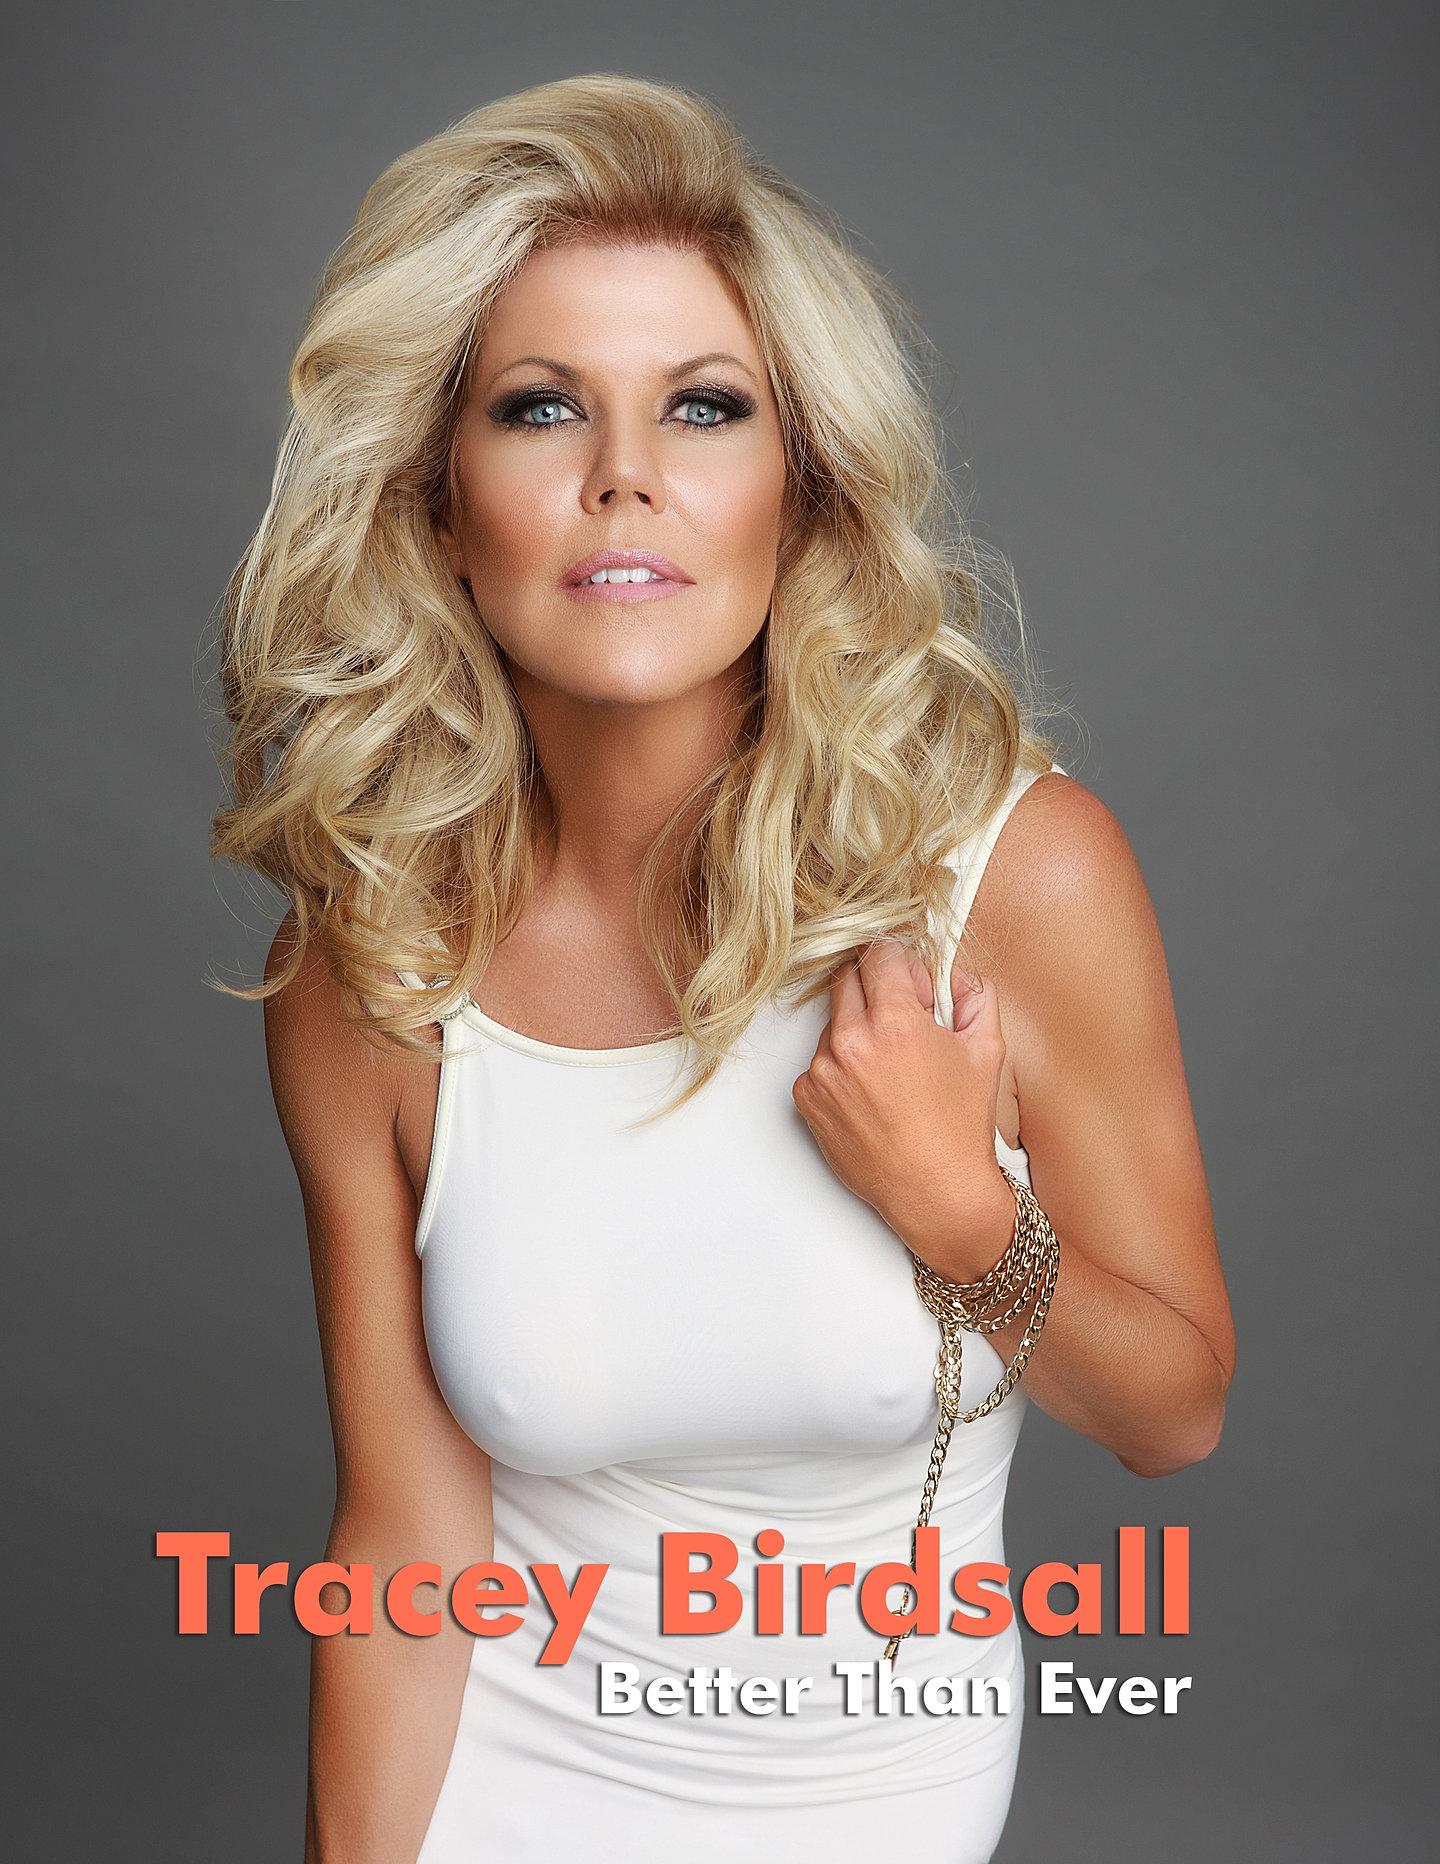 tracey birdsall boyfriend